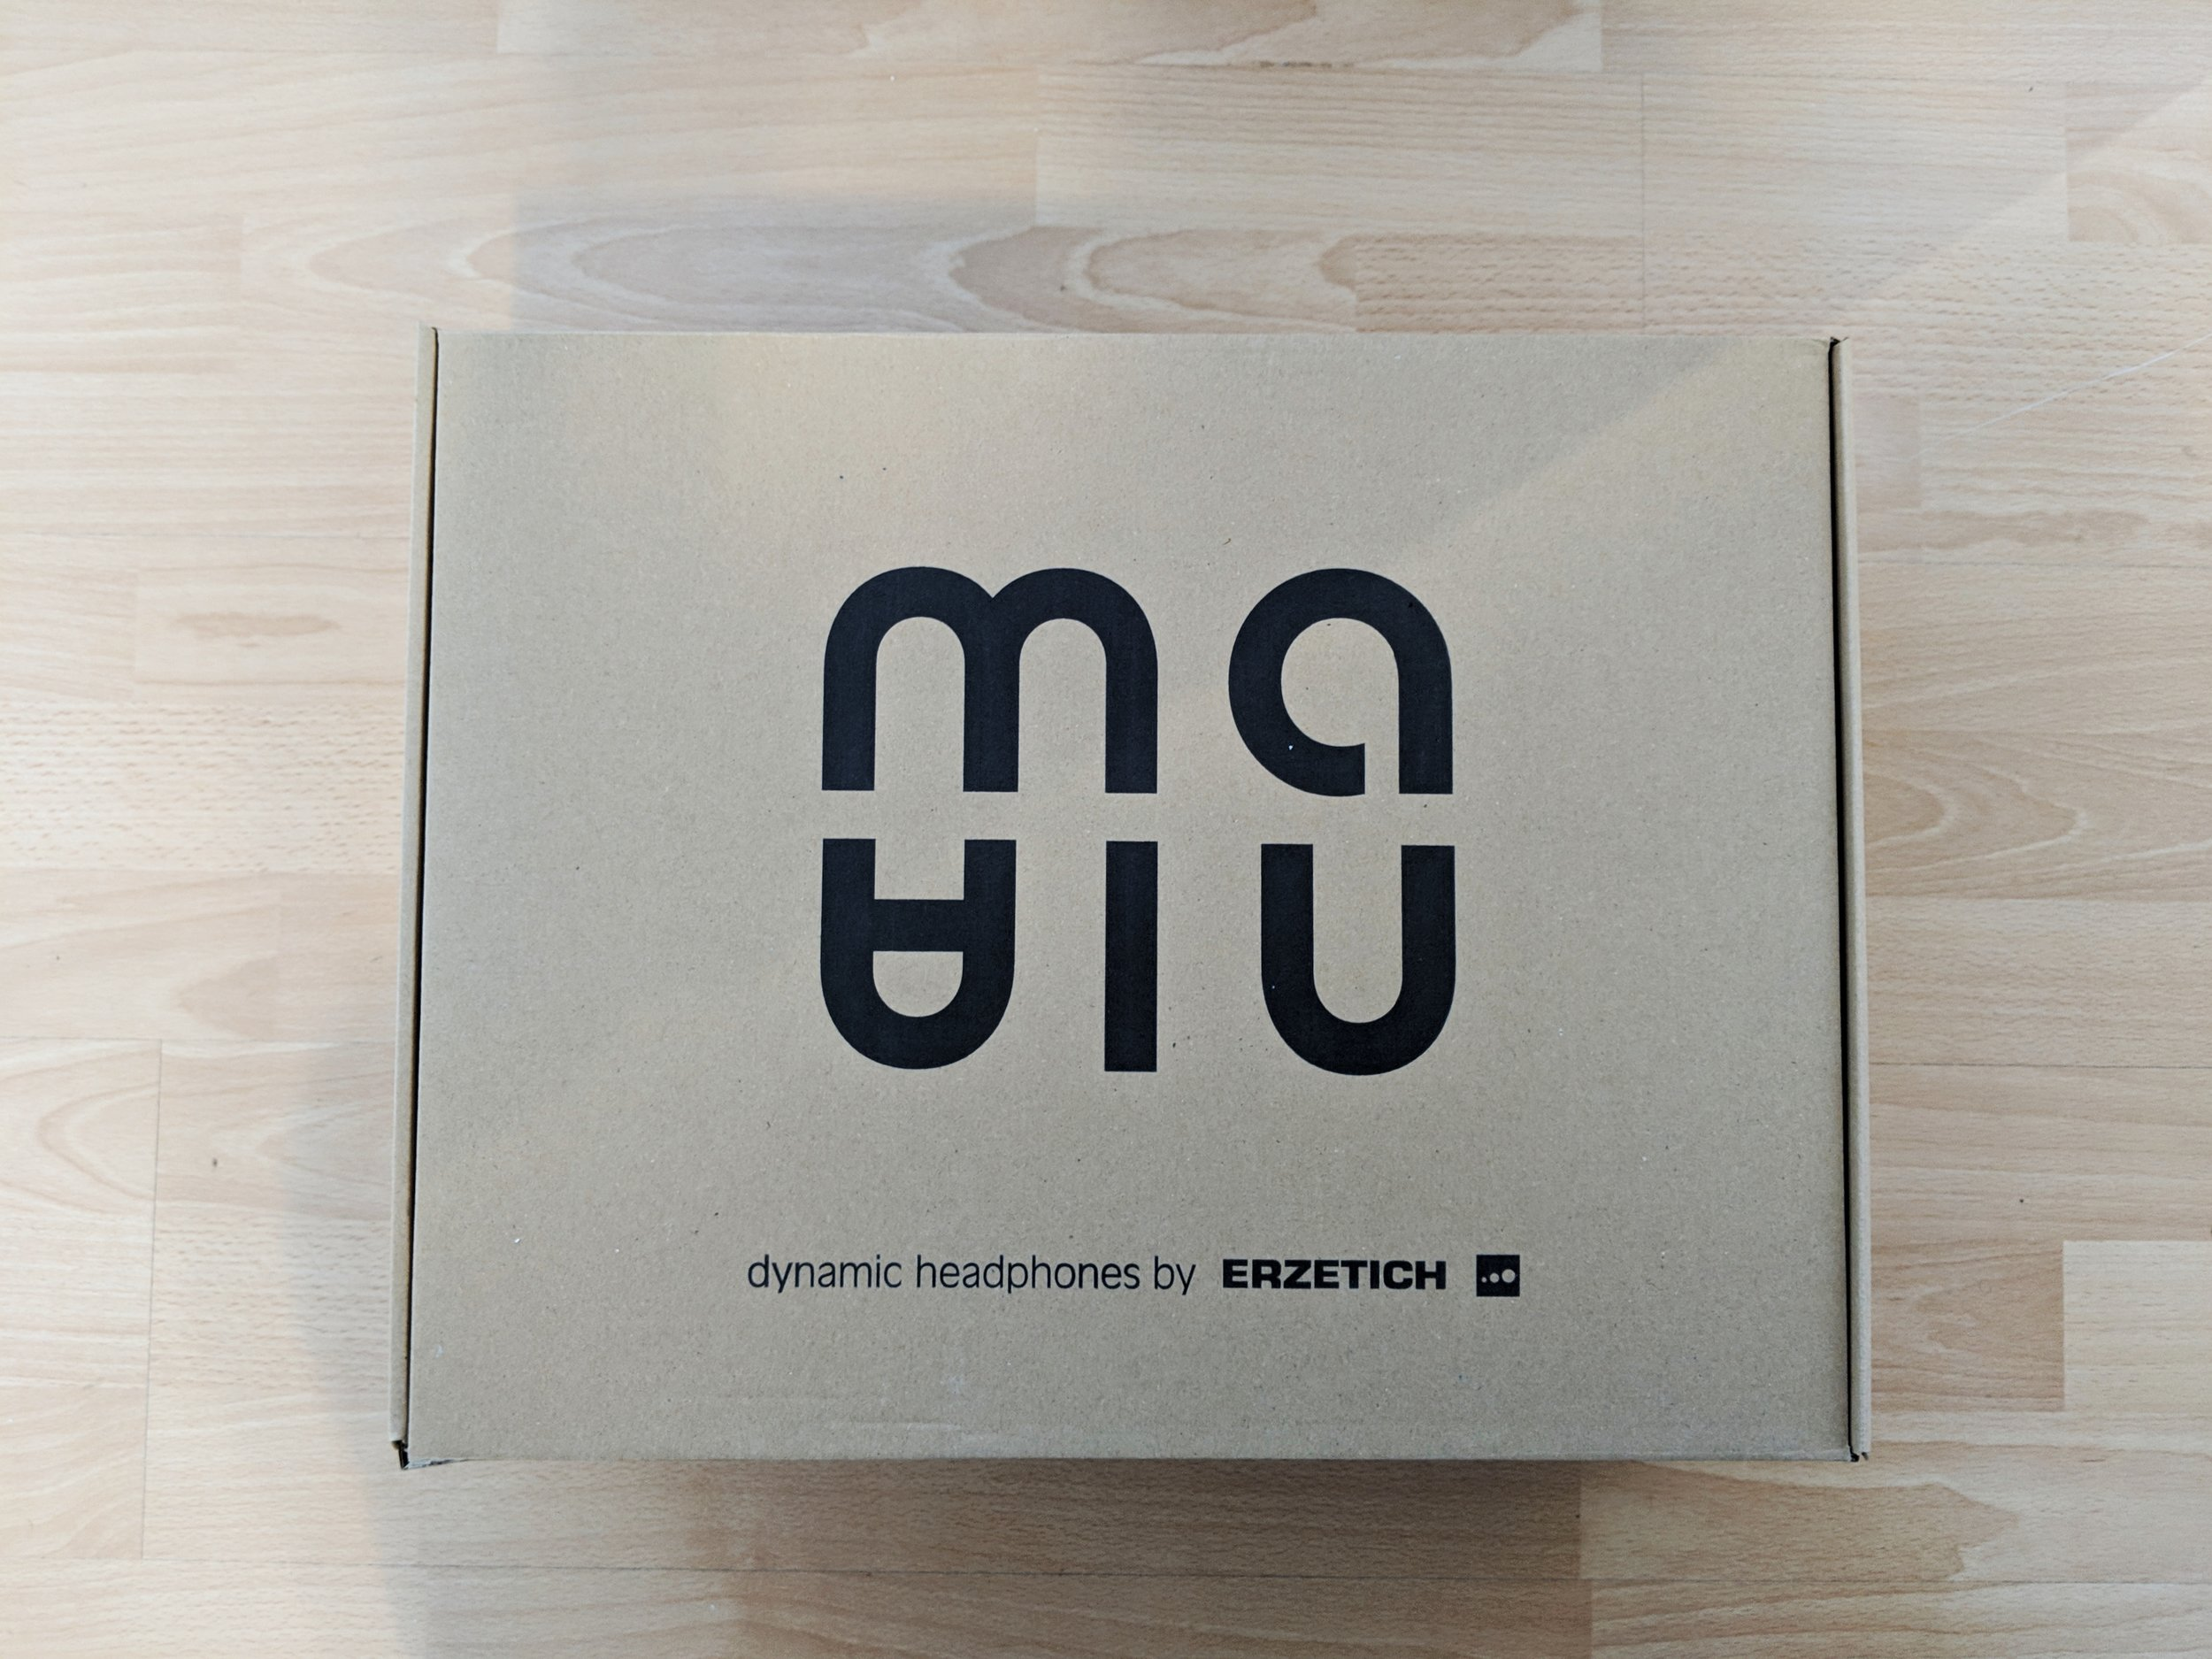 Erzetich Mania headphone box